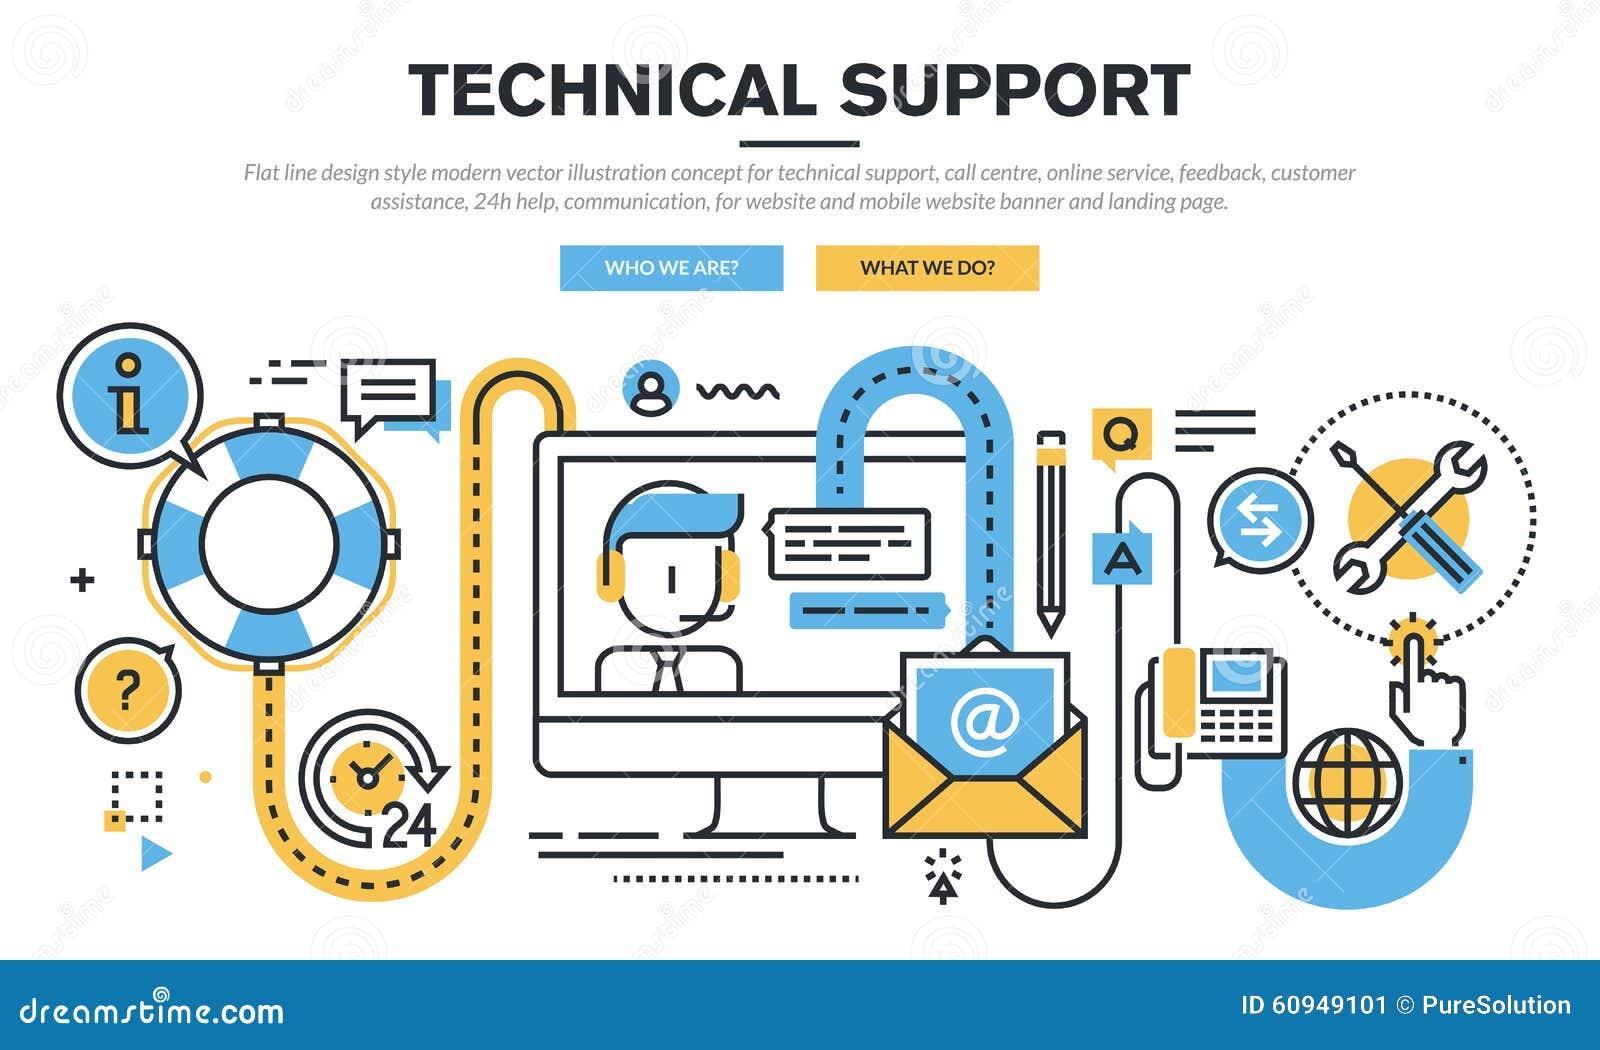 Flat line design vector illustration concept for technical for Online architect services